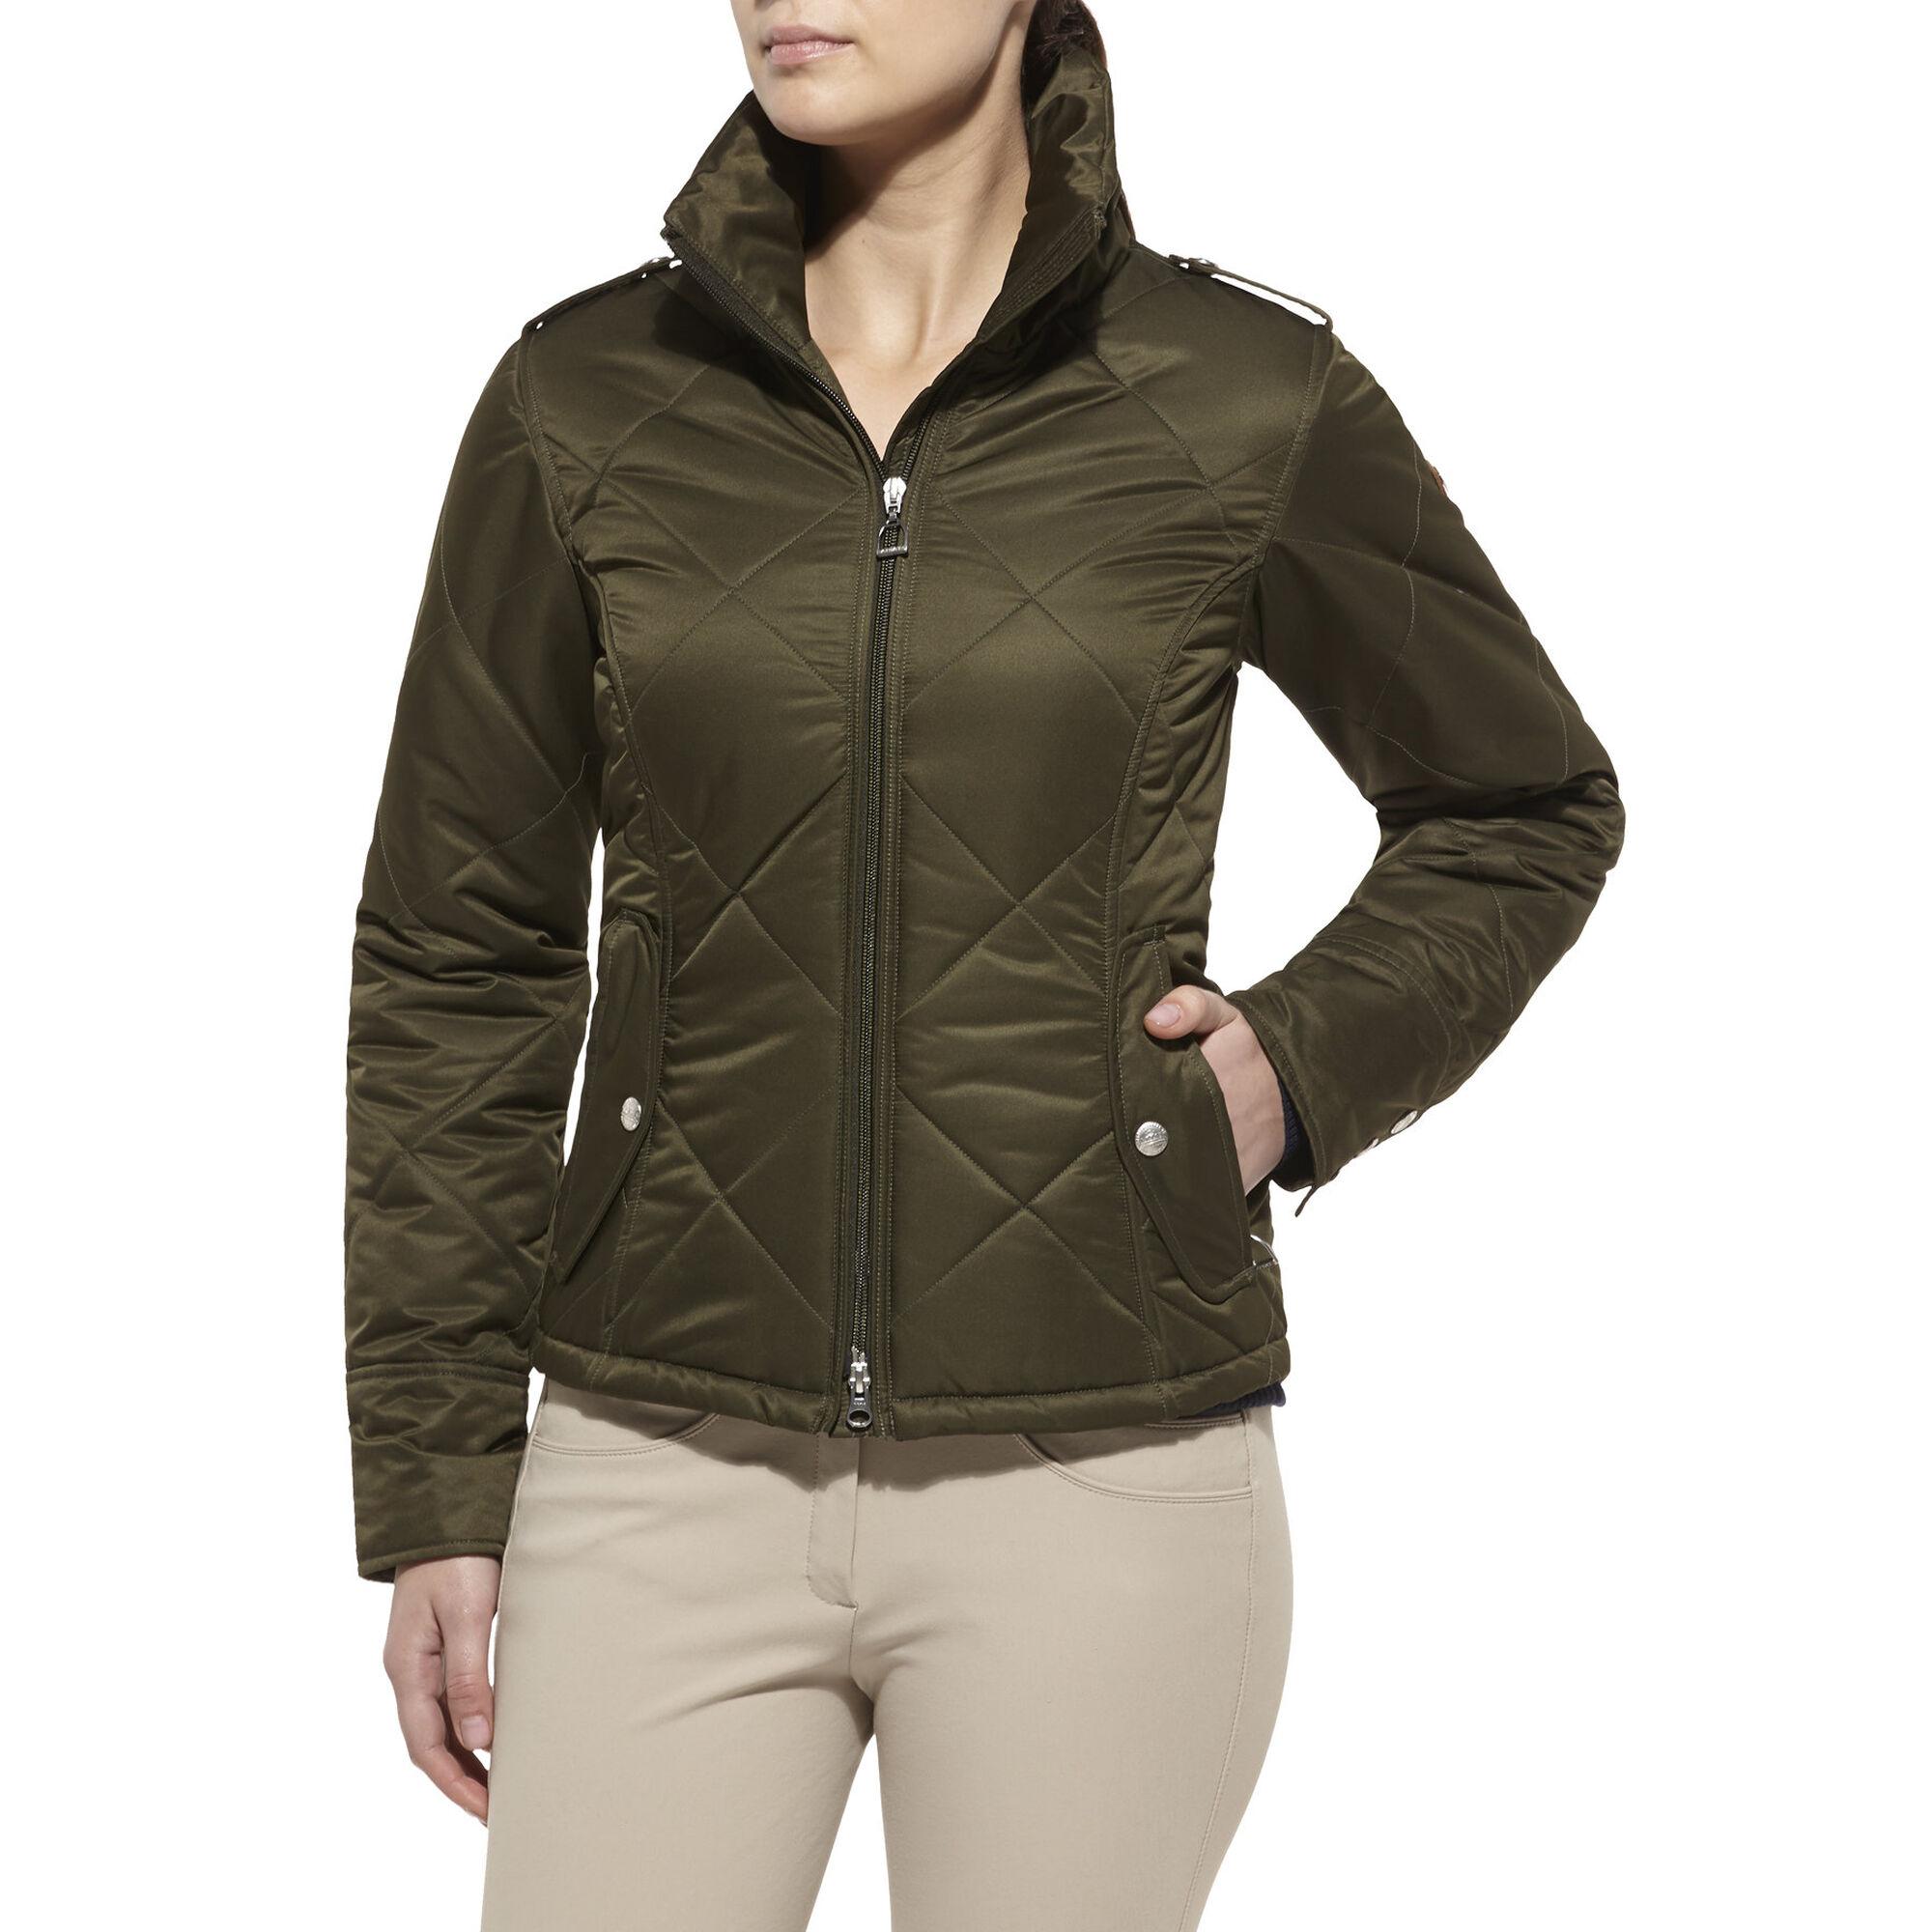 gb hi forward hco barns womens fast viz running jackets wms barn jacket warehouse mountain